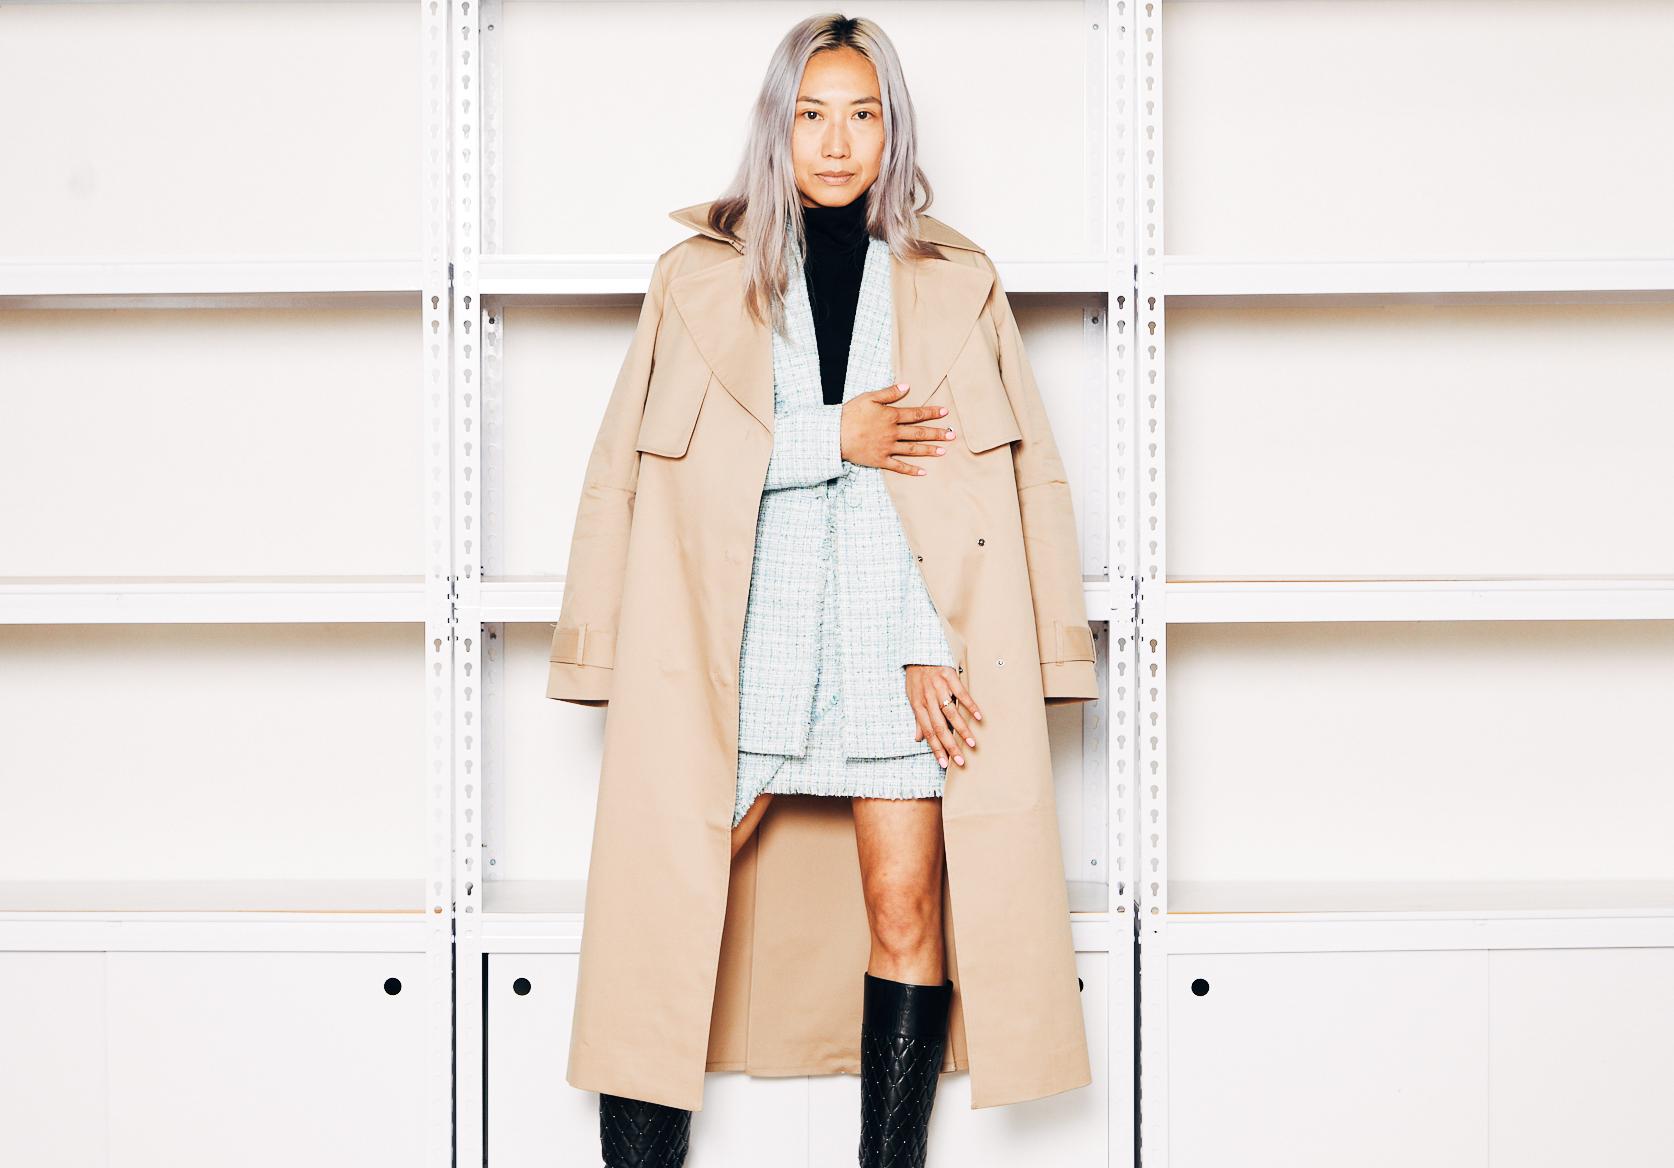 Jade Leung wears Saba trench coat, tweed suit and merino wool half-sleeve top. Boots stylist's own.